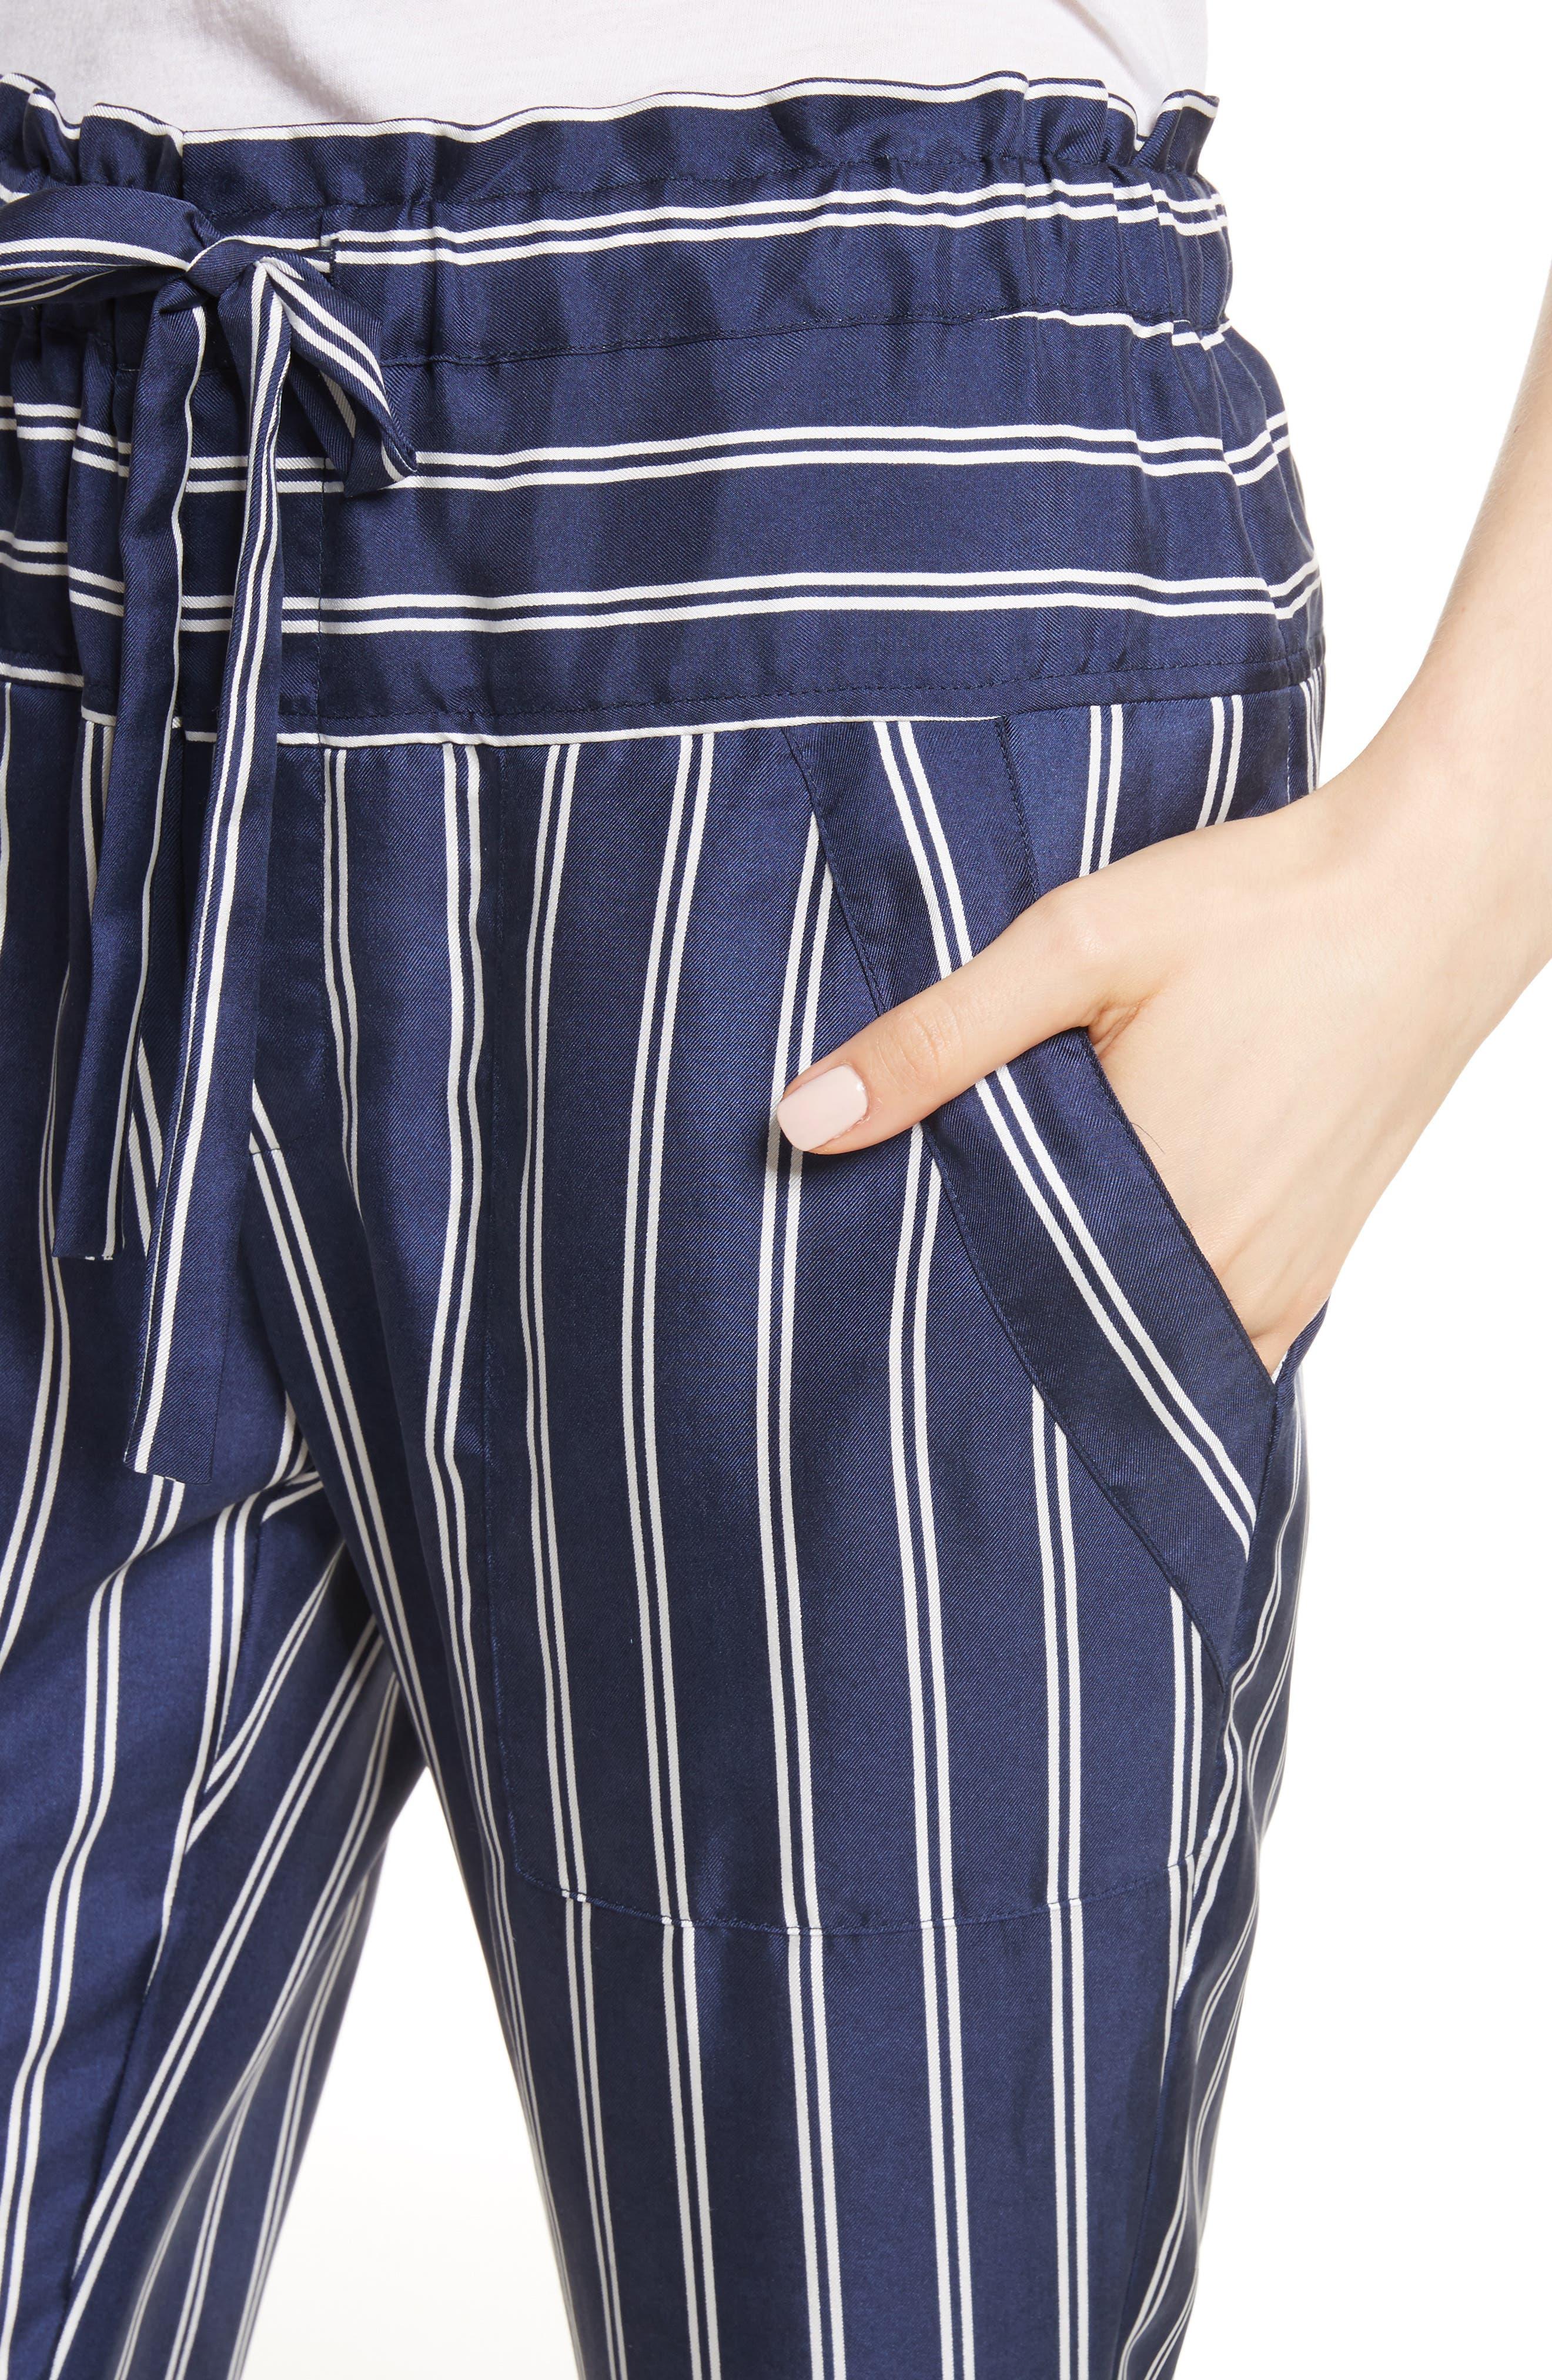 Addiena Stripe Silk Pants,                             Alternate thumbnail 4, color,                             Dark Navy